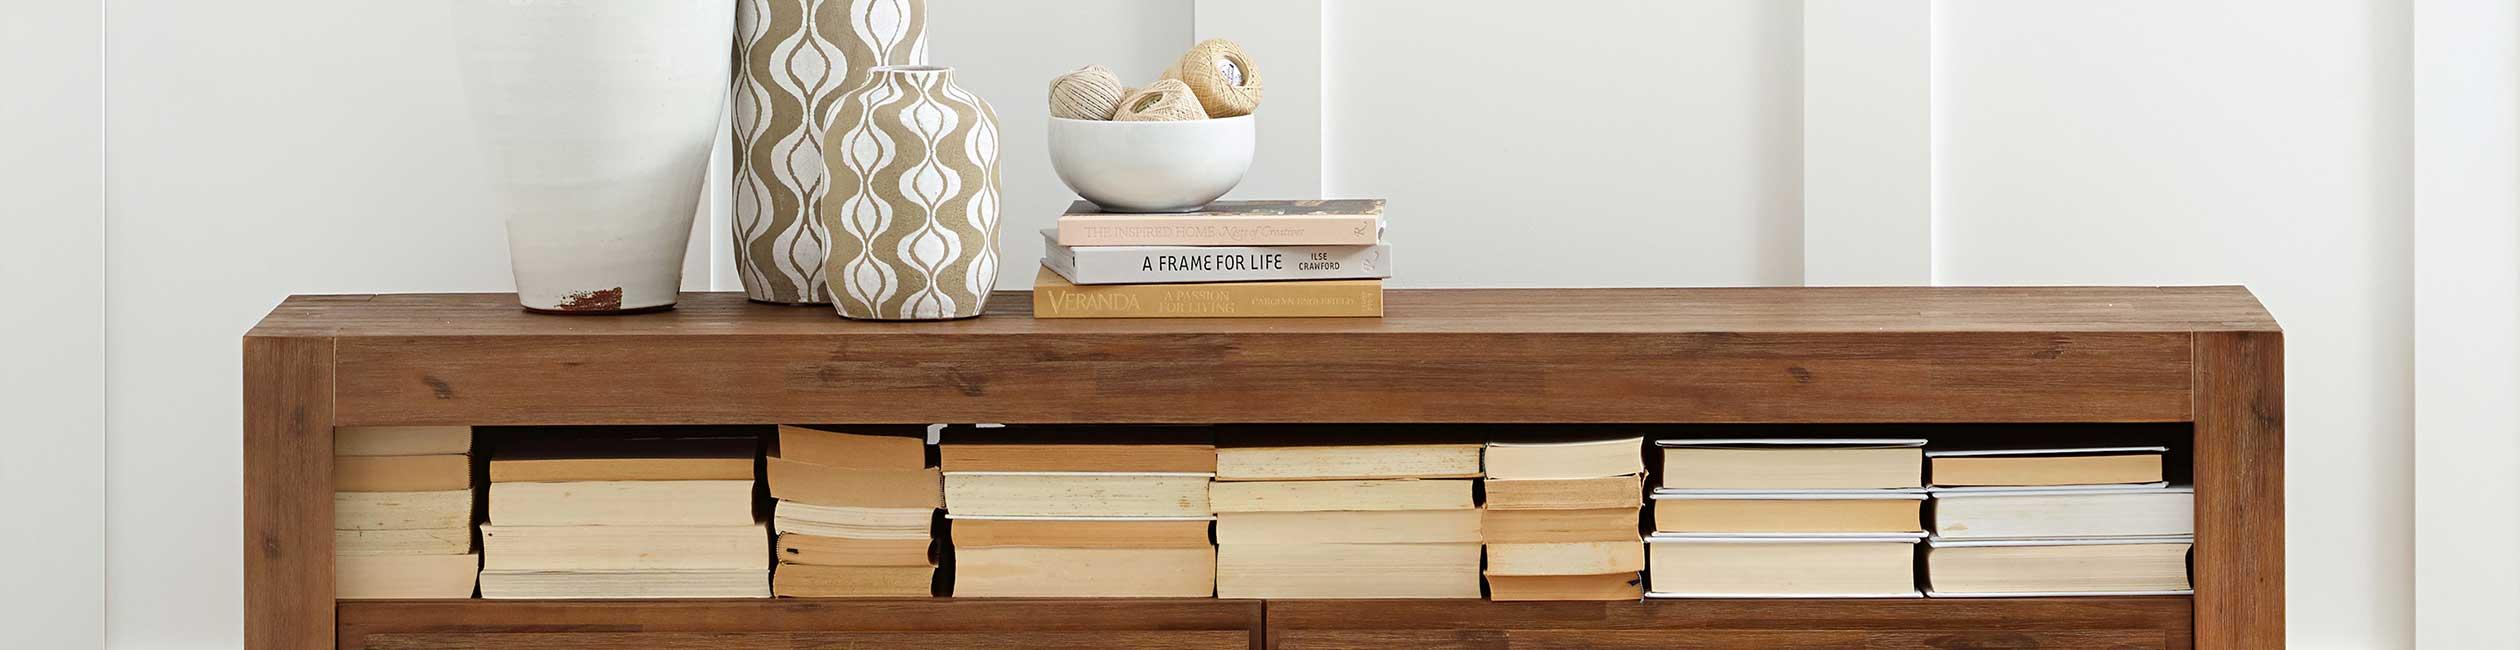 Entertainment Units Bookshelf Tv Cabinets Bookcase